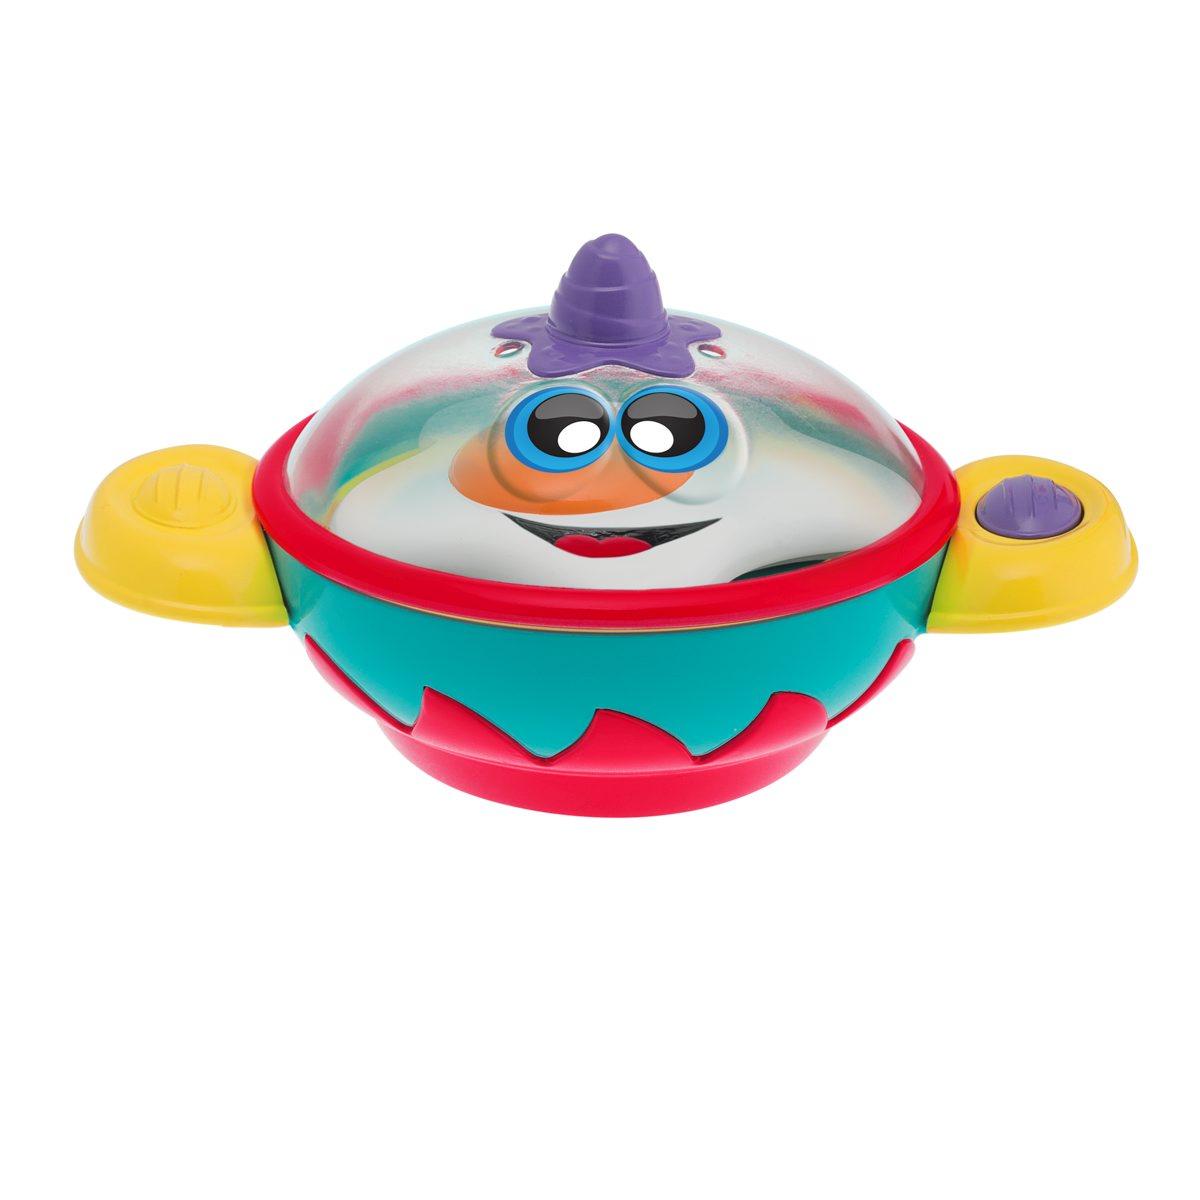 Chicco Музыкальная игрушка Кастрюлька музыкальные игрушки chicco кастрюлька стэн 6 36 месяцев